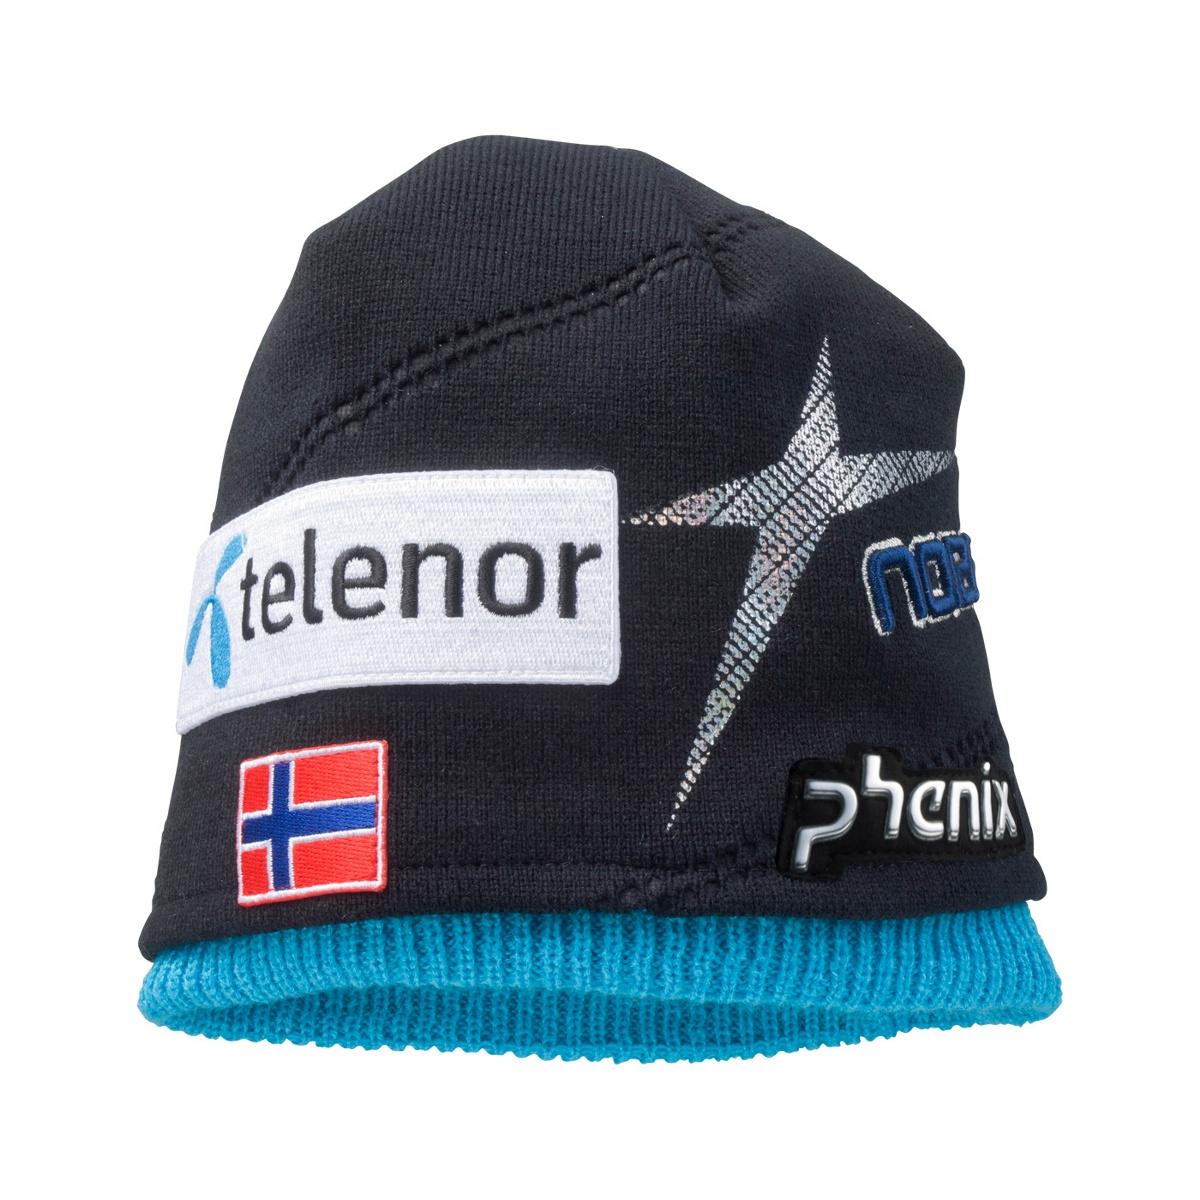 Phenix Norway Alpine Team Knit Hat at NorwaySports.com Archive 1aa9fa6bb3e